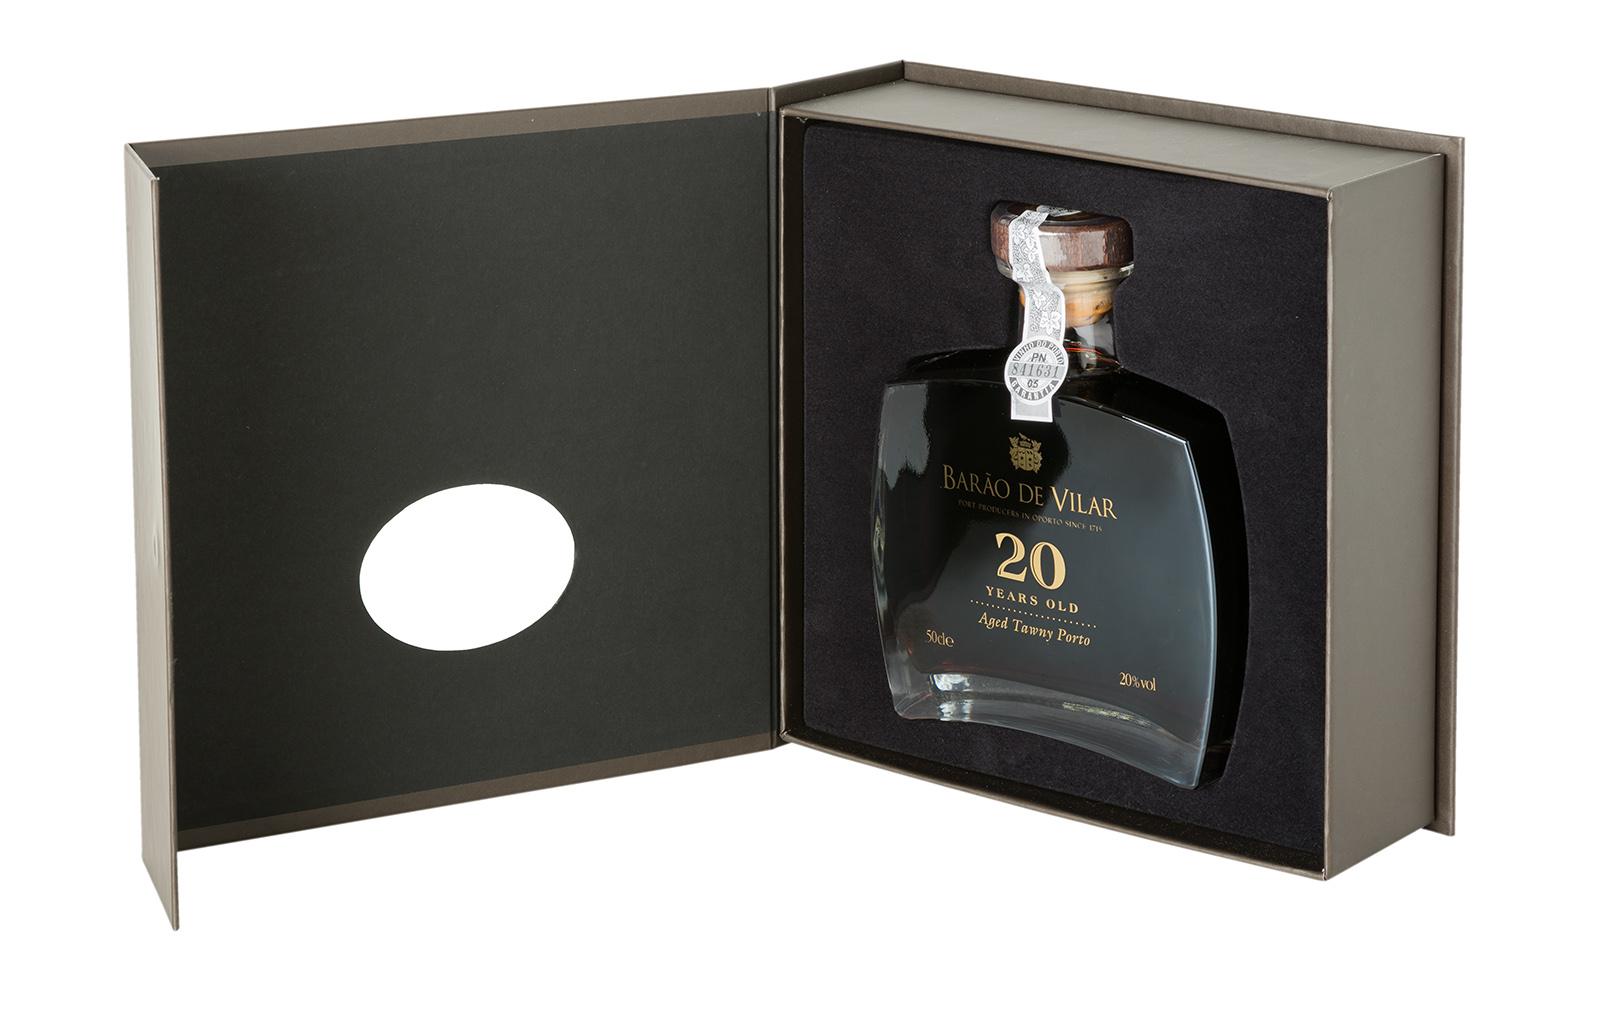 Barão de Vilar 20 Years Old 50cl Callisto & gift box.jpg